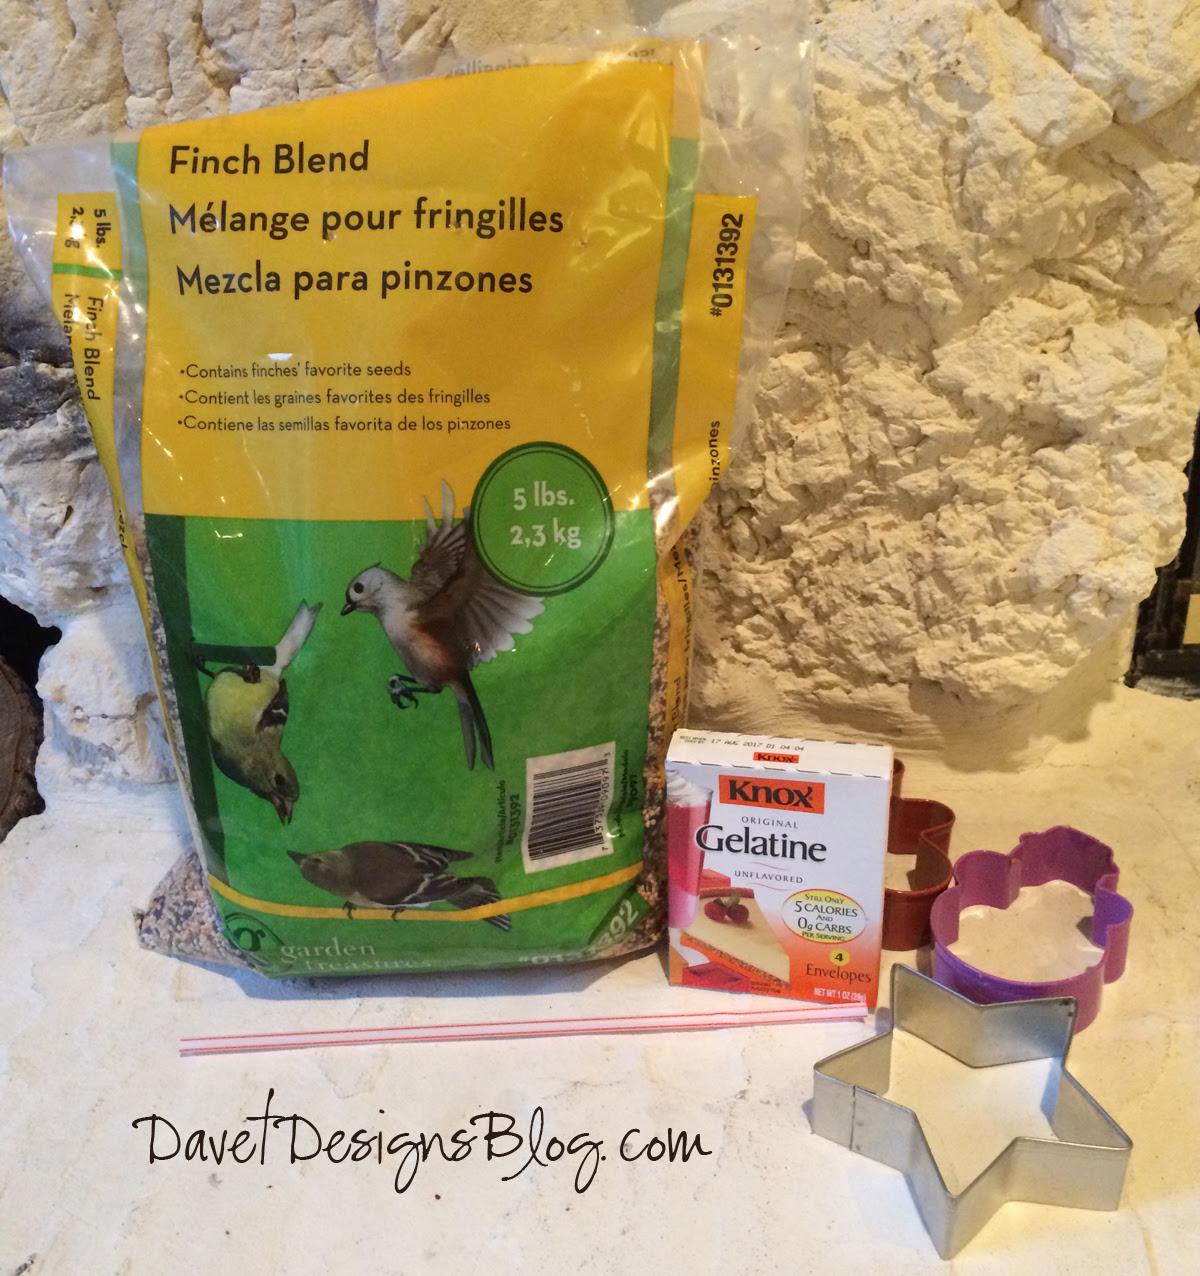 Cookie Cutter Bird Seed Feeder Ornaments supplies